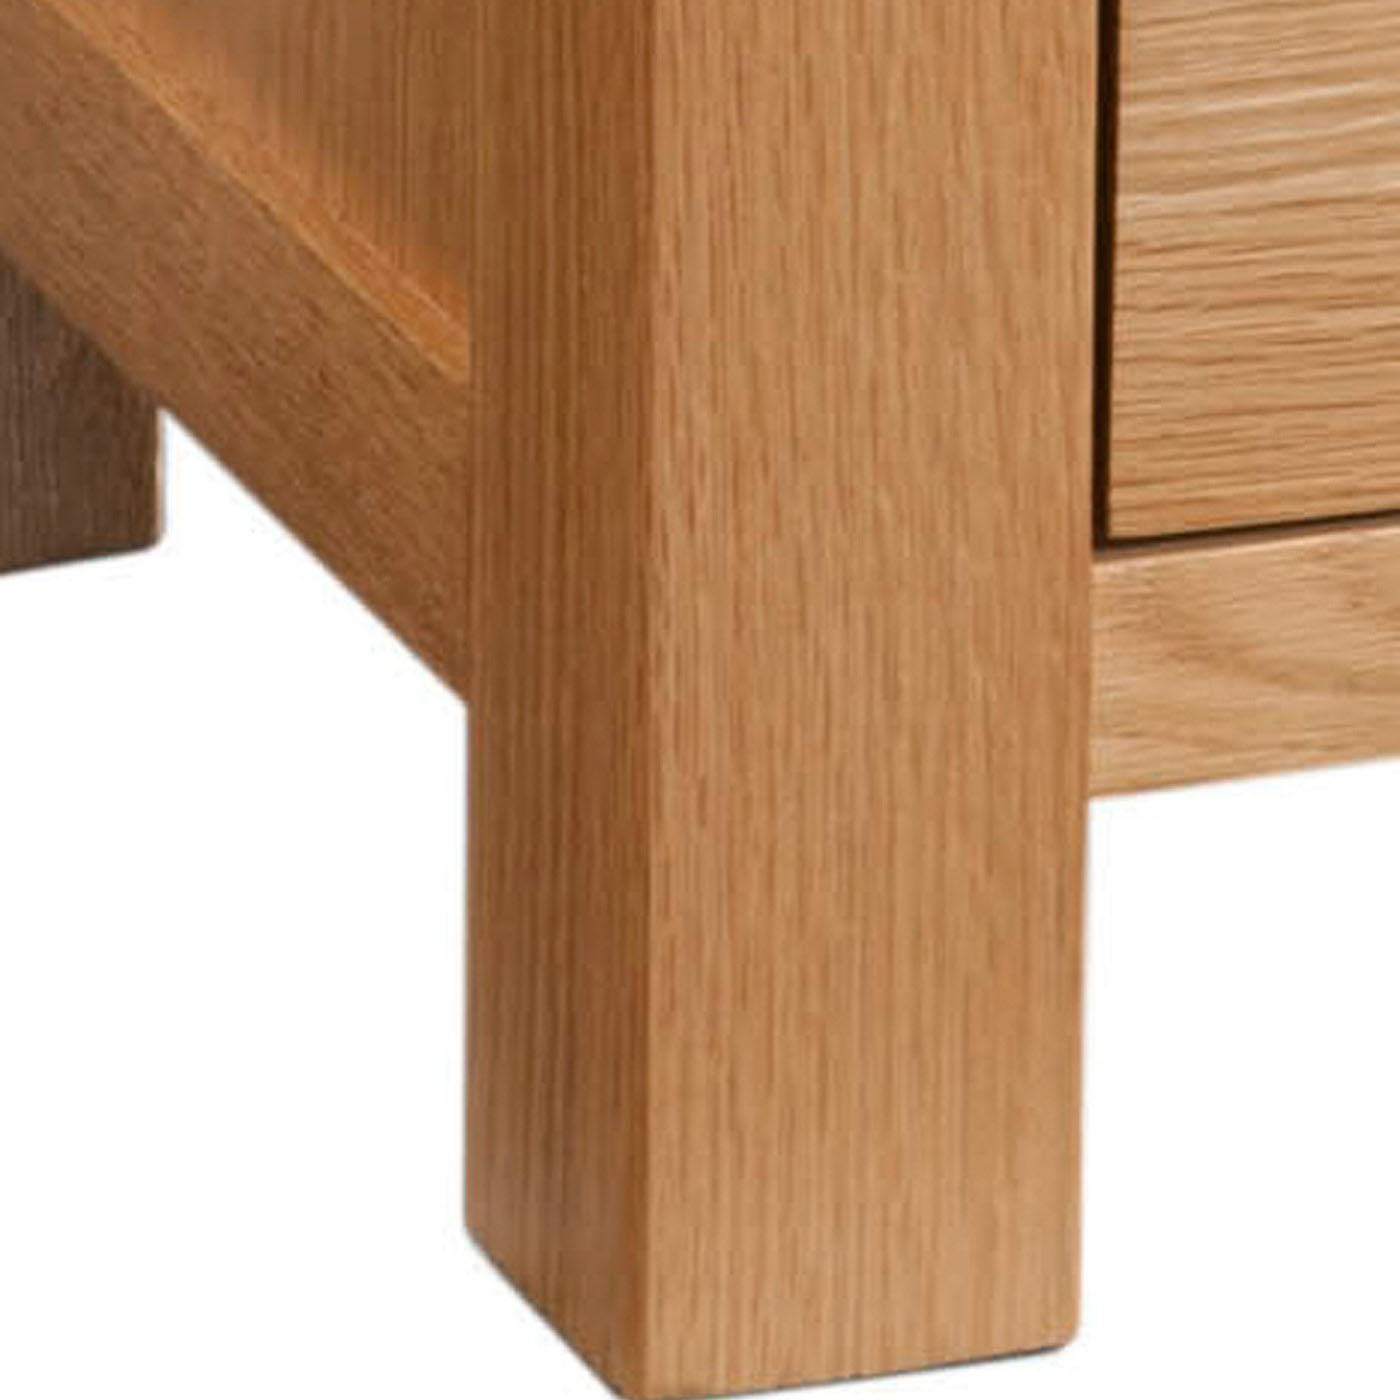 Maiden Oak Compact 3 Drawer Bedside